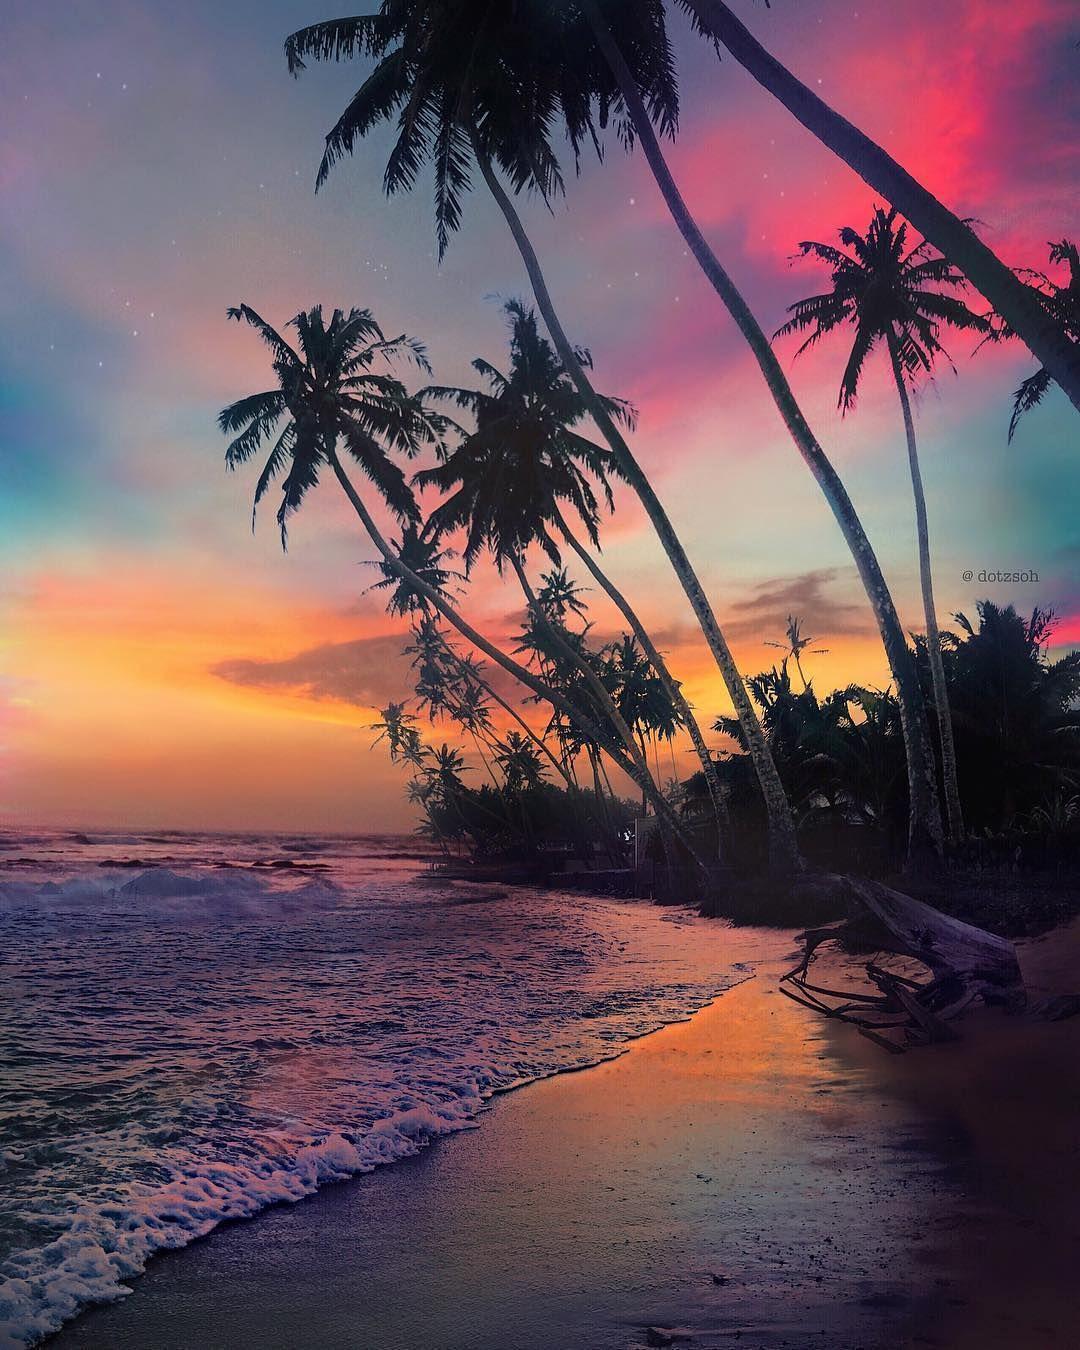 Present L O C A T I O N Sri Lanka P H O T O Dotzsoh